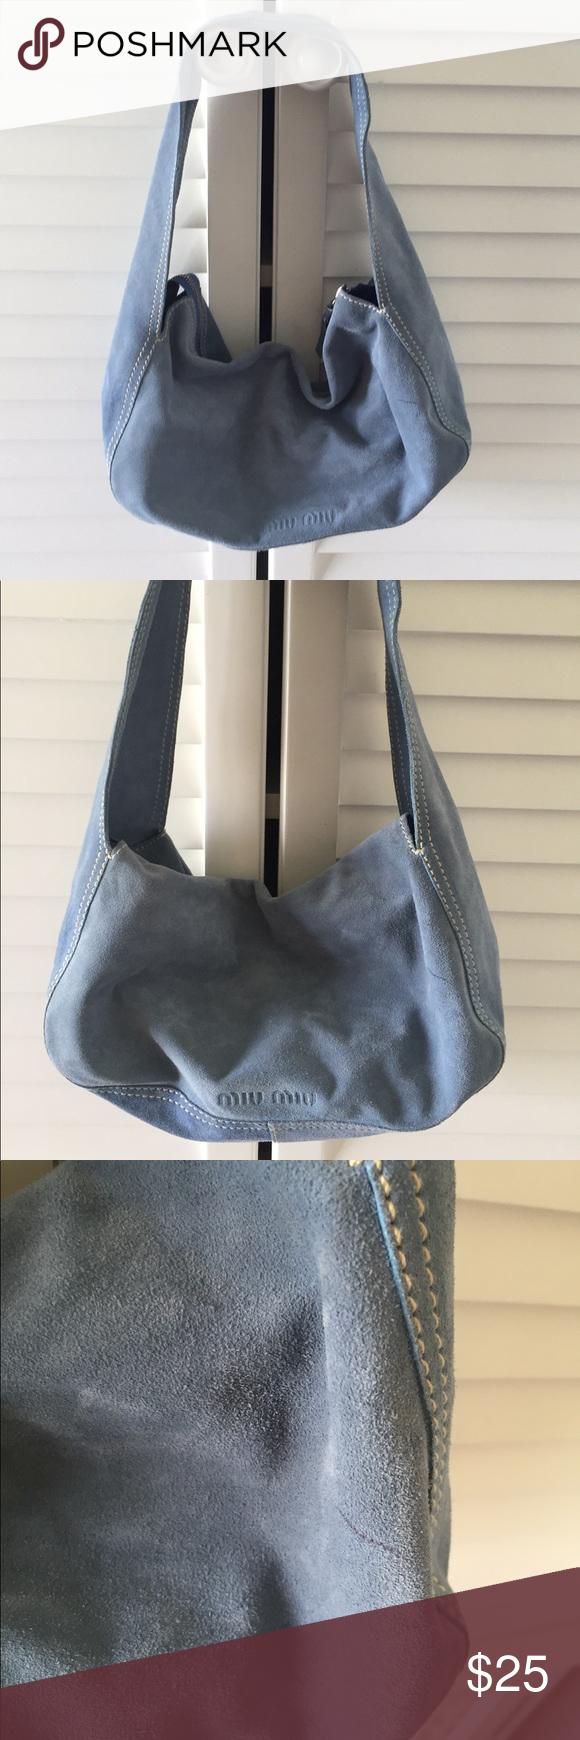 Miu Miu blue suede hobo shoulder bag small Italy Miu Miu blue sides small  shoulder bag. Zippered top and one zippered pocket inside. 3944bd3182